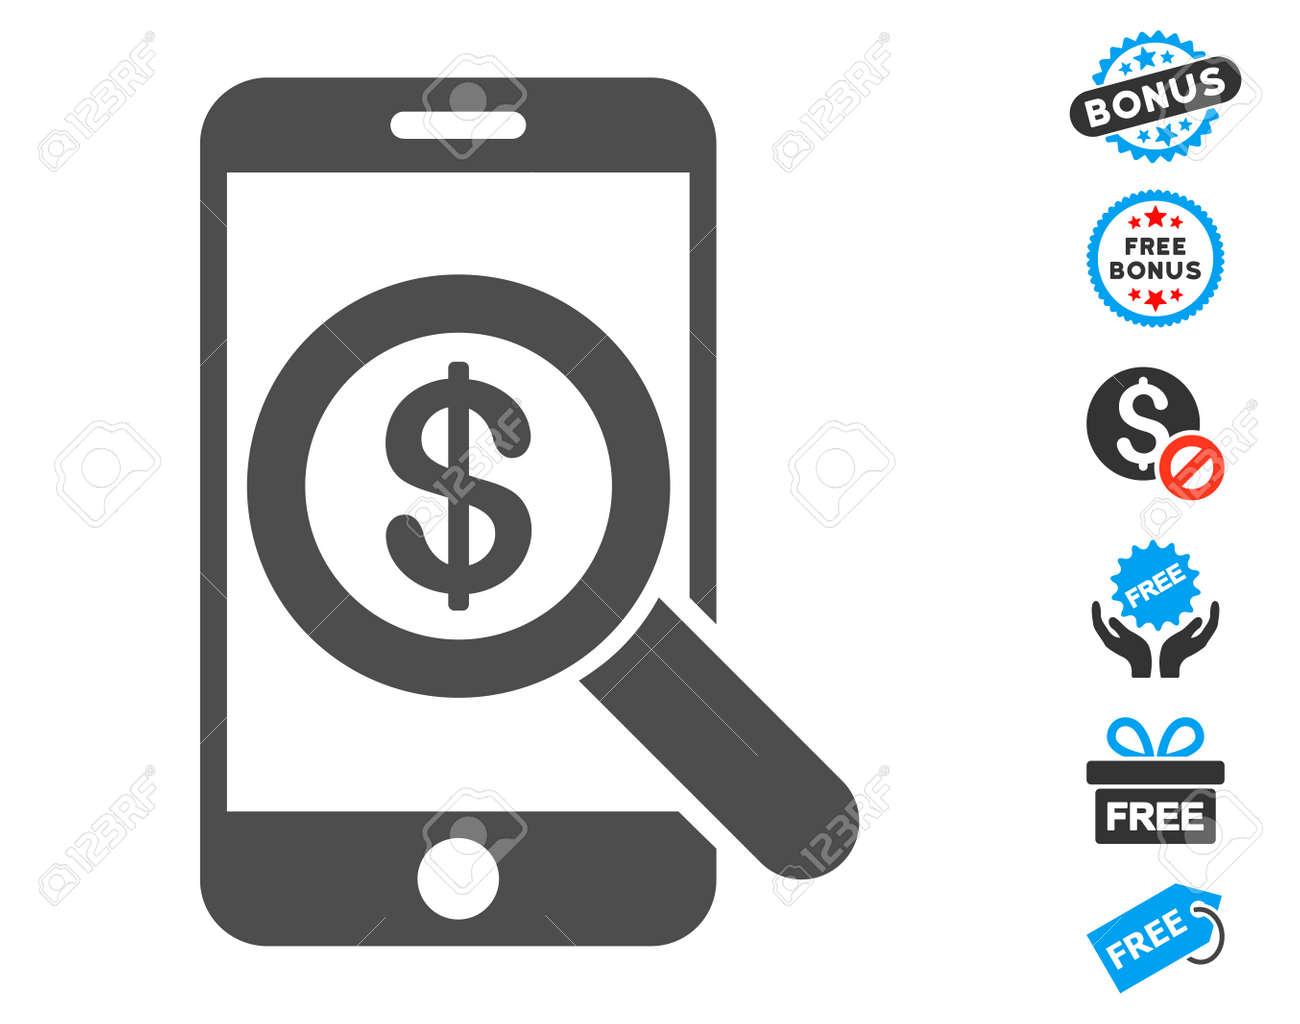 Mobile audit gray pictogram with free bonus symbols vector mobile audit gray pictogram with free bonus symbols vector illustration style is flat iconic symbols biocorpaavc Images